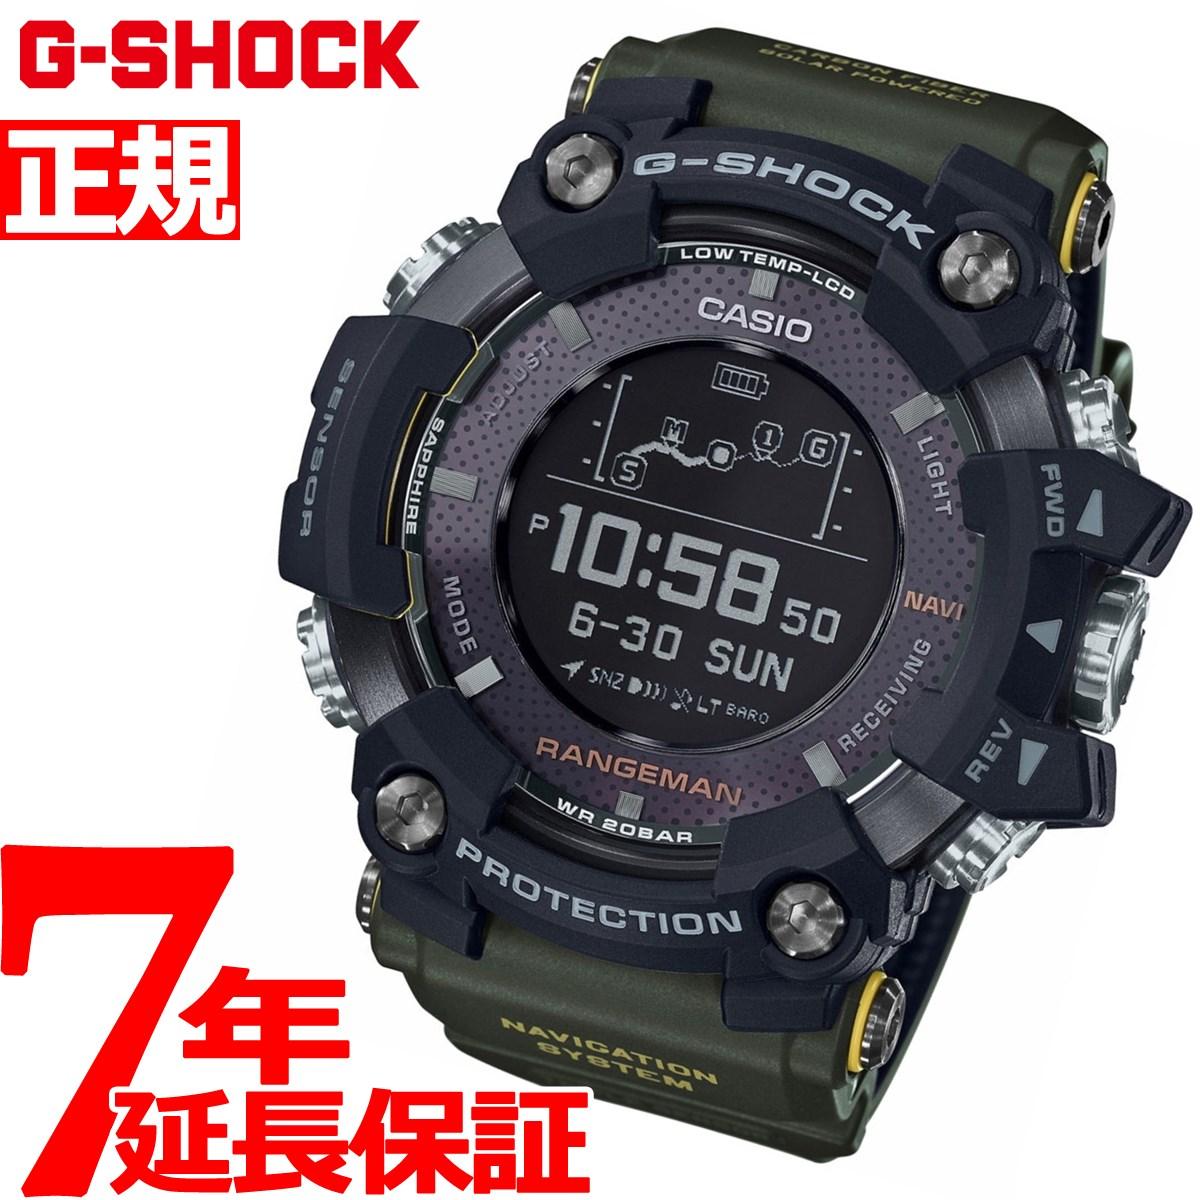 G-SHOCK GPS 電波 ソーラー 電波時計 カシオ Gショック レンジマン CASIO RANGEMAN Bluetooth搭載 腕時計 メンズ GPR-B1000-1BJR【2018 新作】